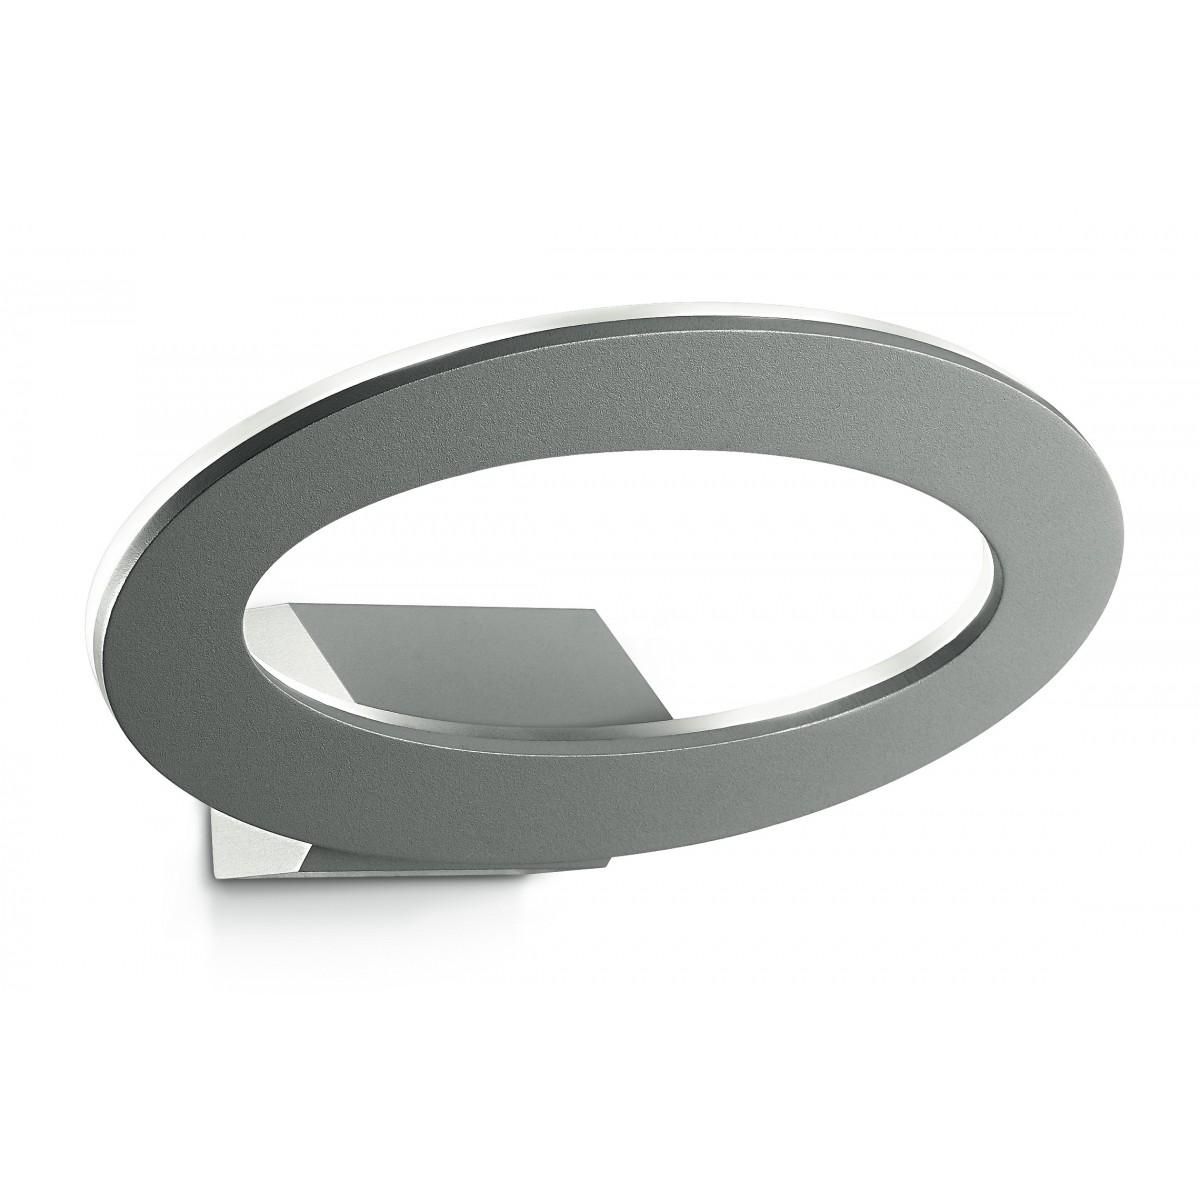 LED-EROS-AP Applique Lampada da Esterno In Alluminio Elittica A led 3000k